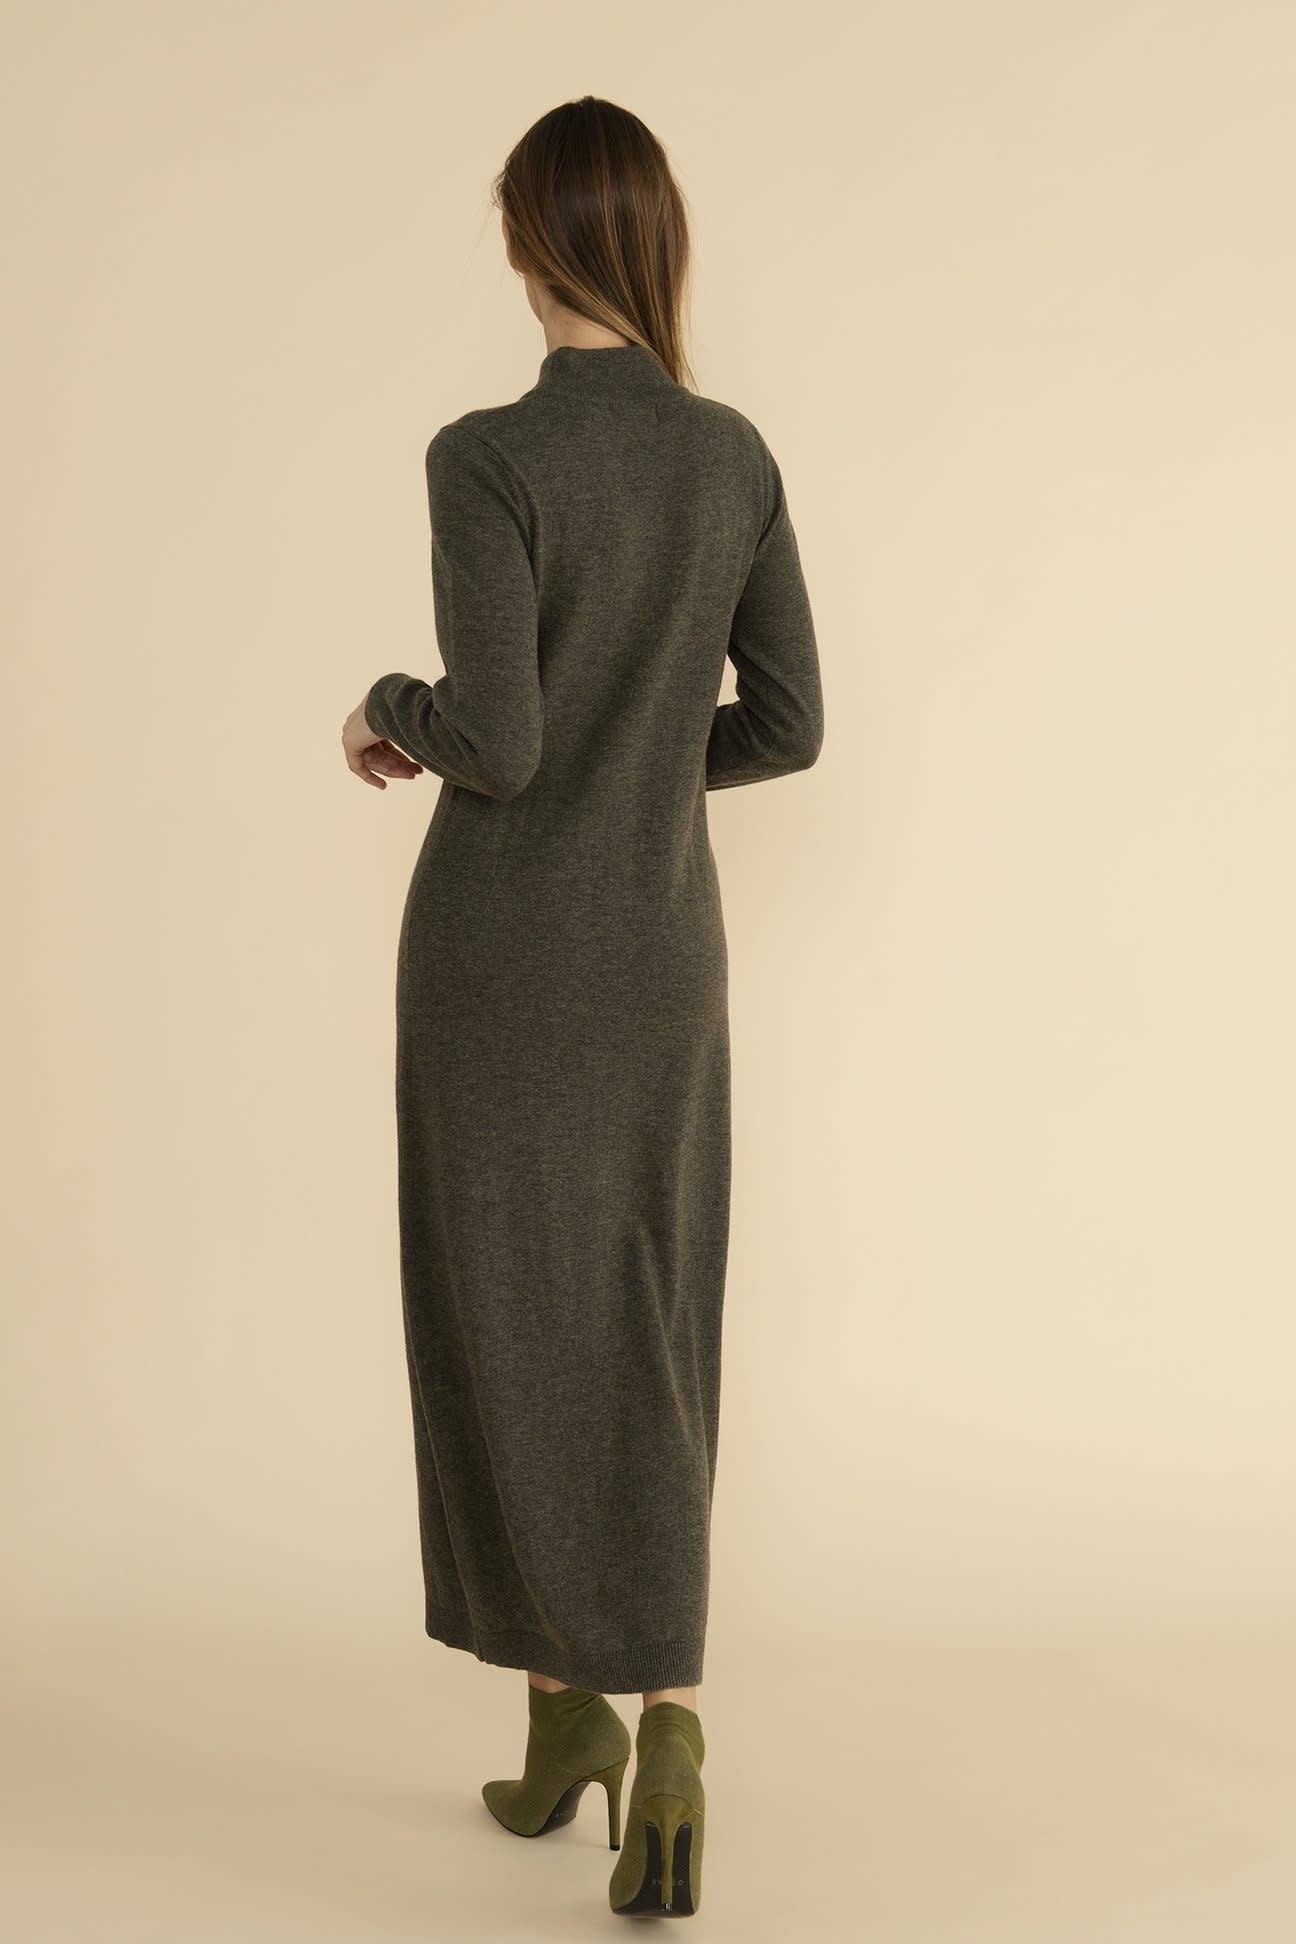 Iris dress Oscar-2